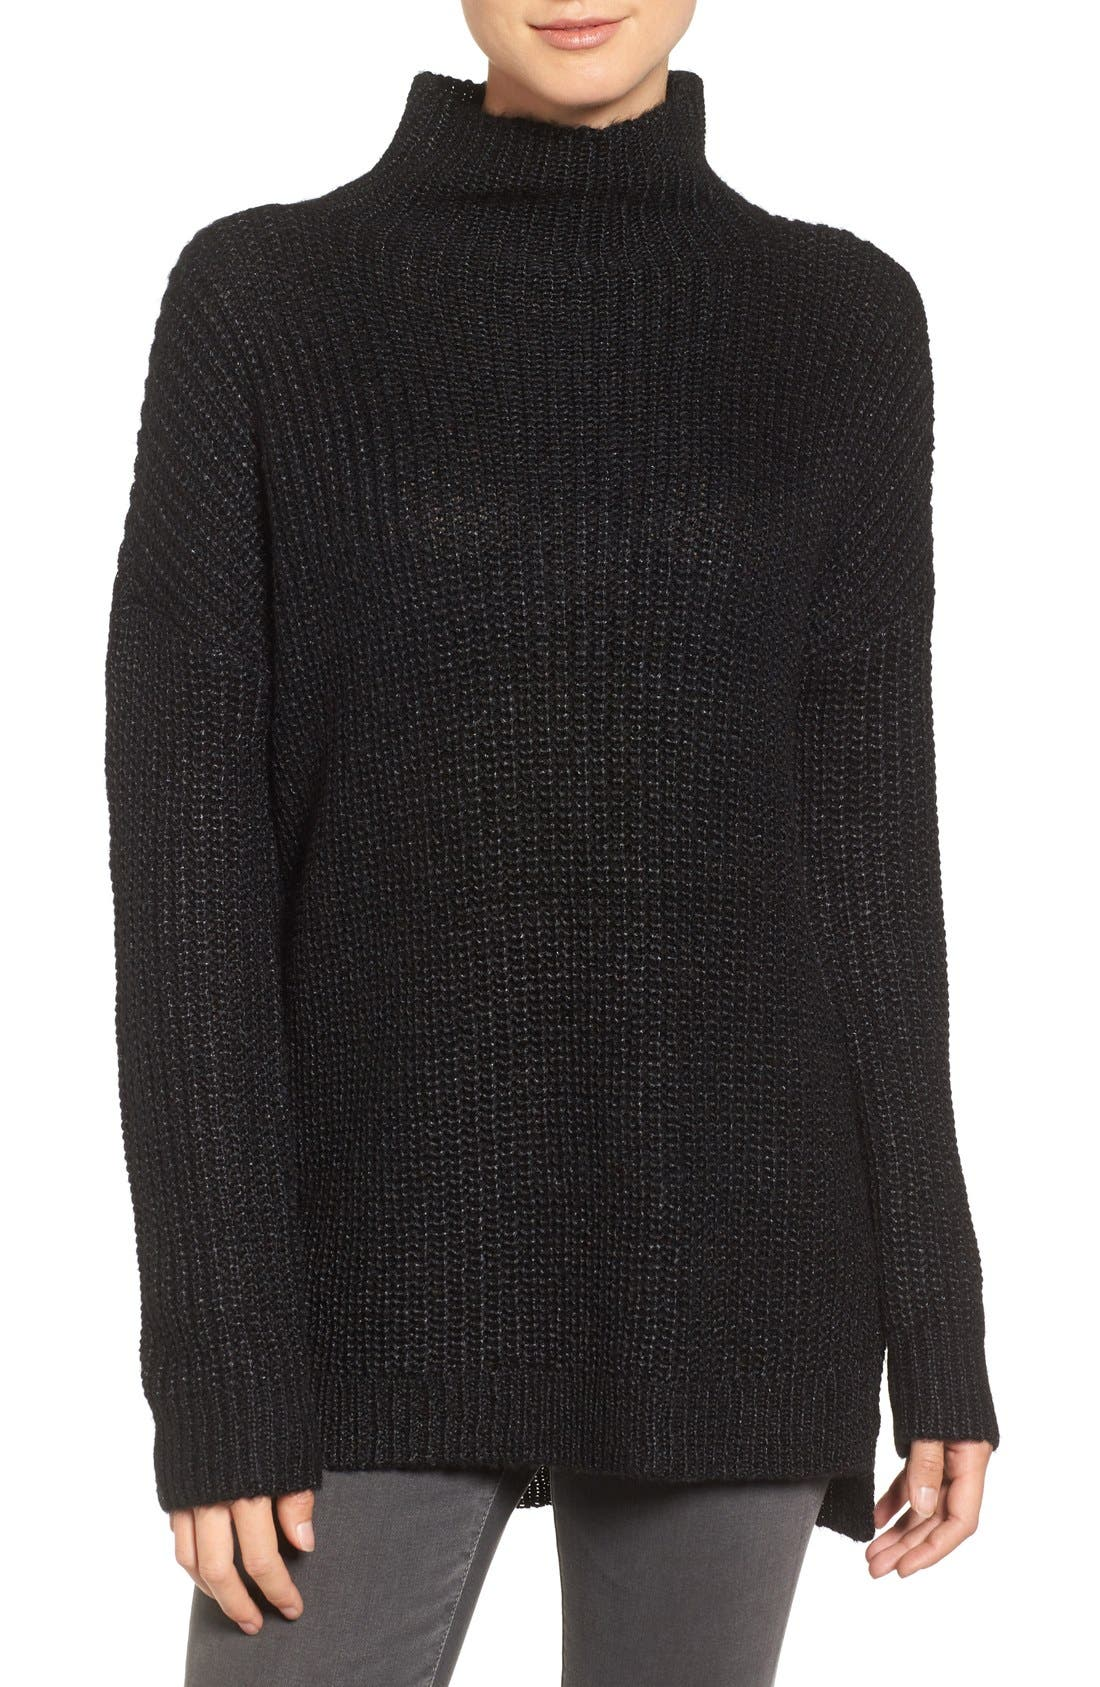 Alternate Image 1 Selected - Trouvé Rib Knit Sweater